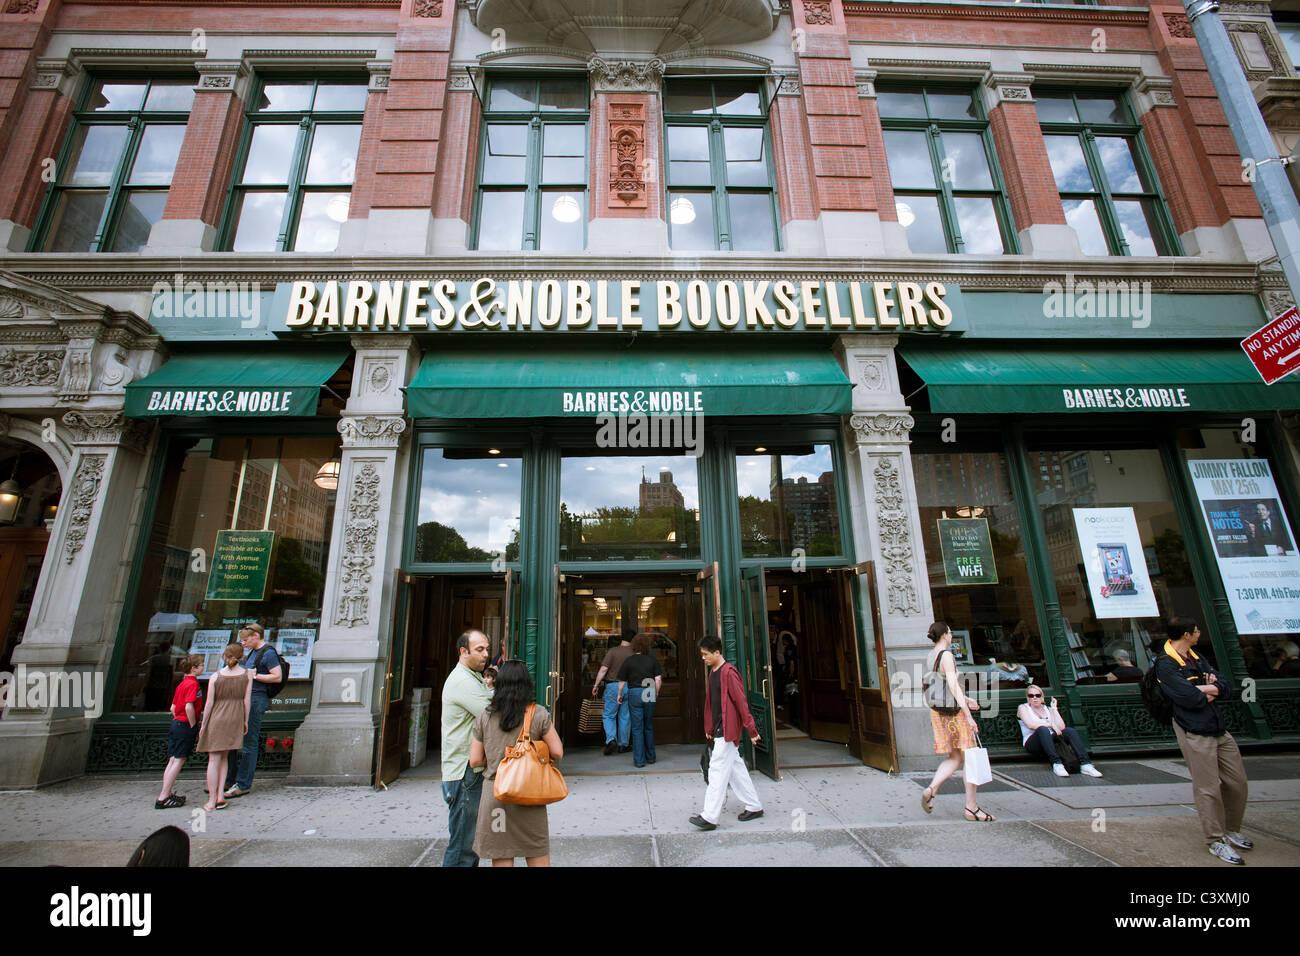 Barnes Amp Noble Bookstore Off Of Union Square In New York